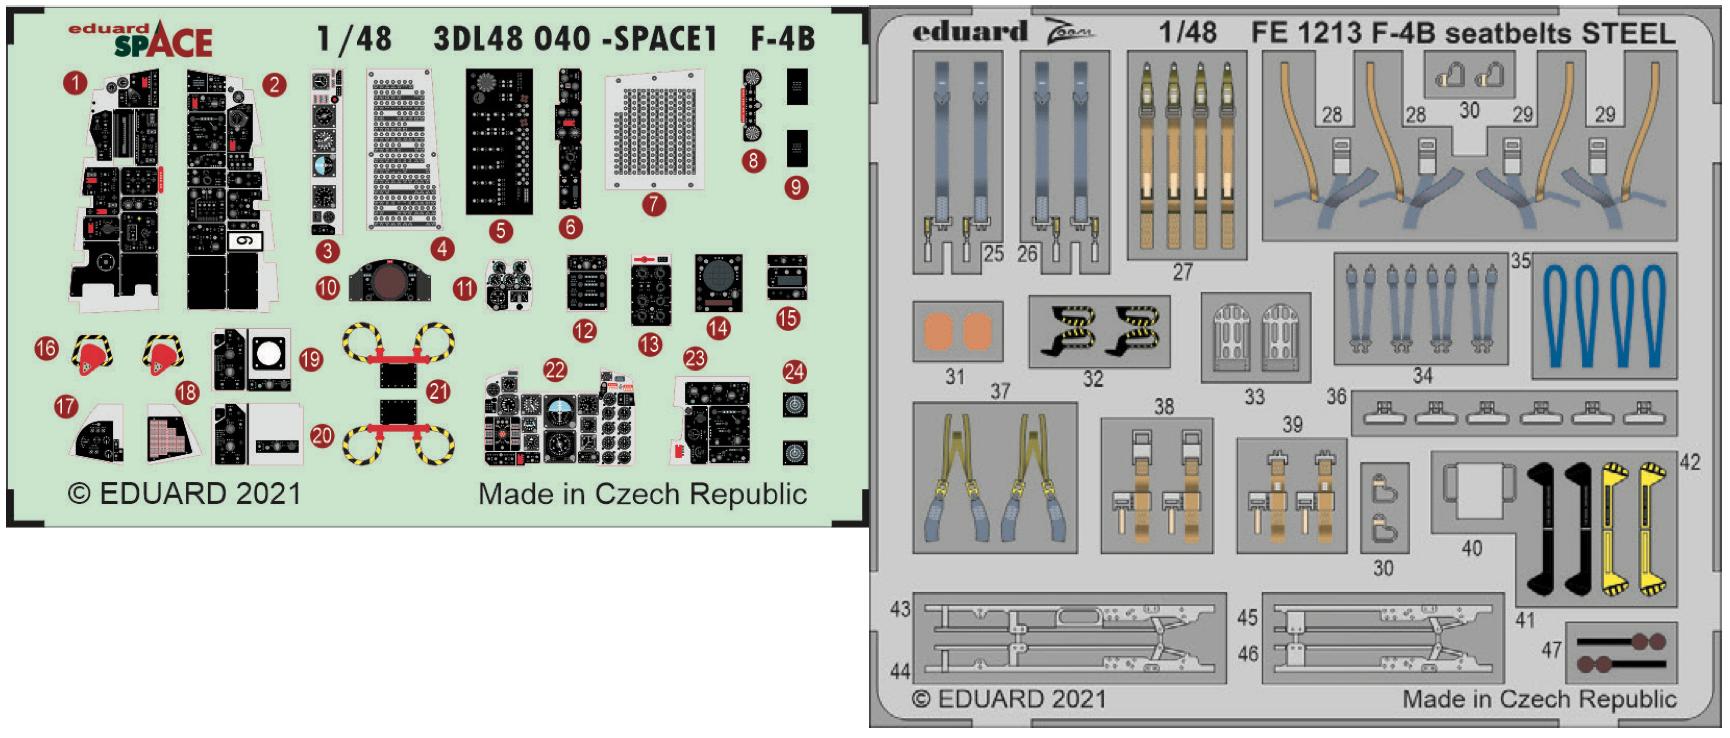 ED3DL48040